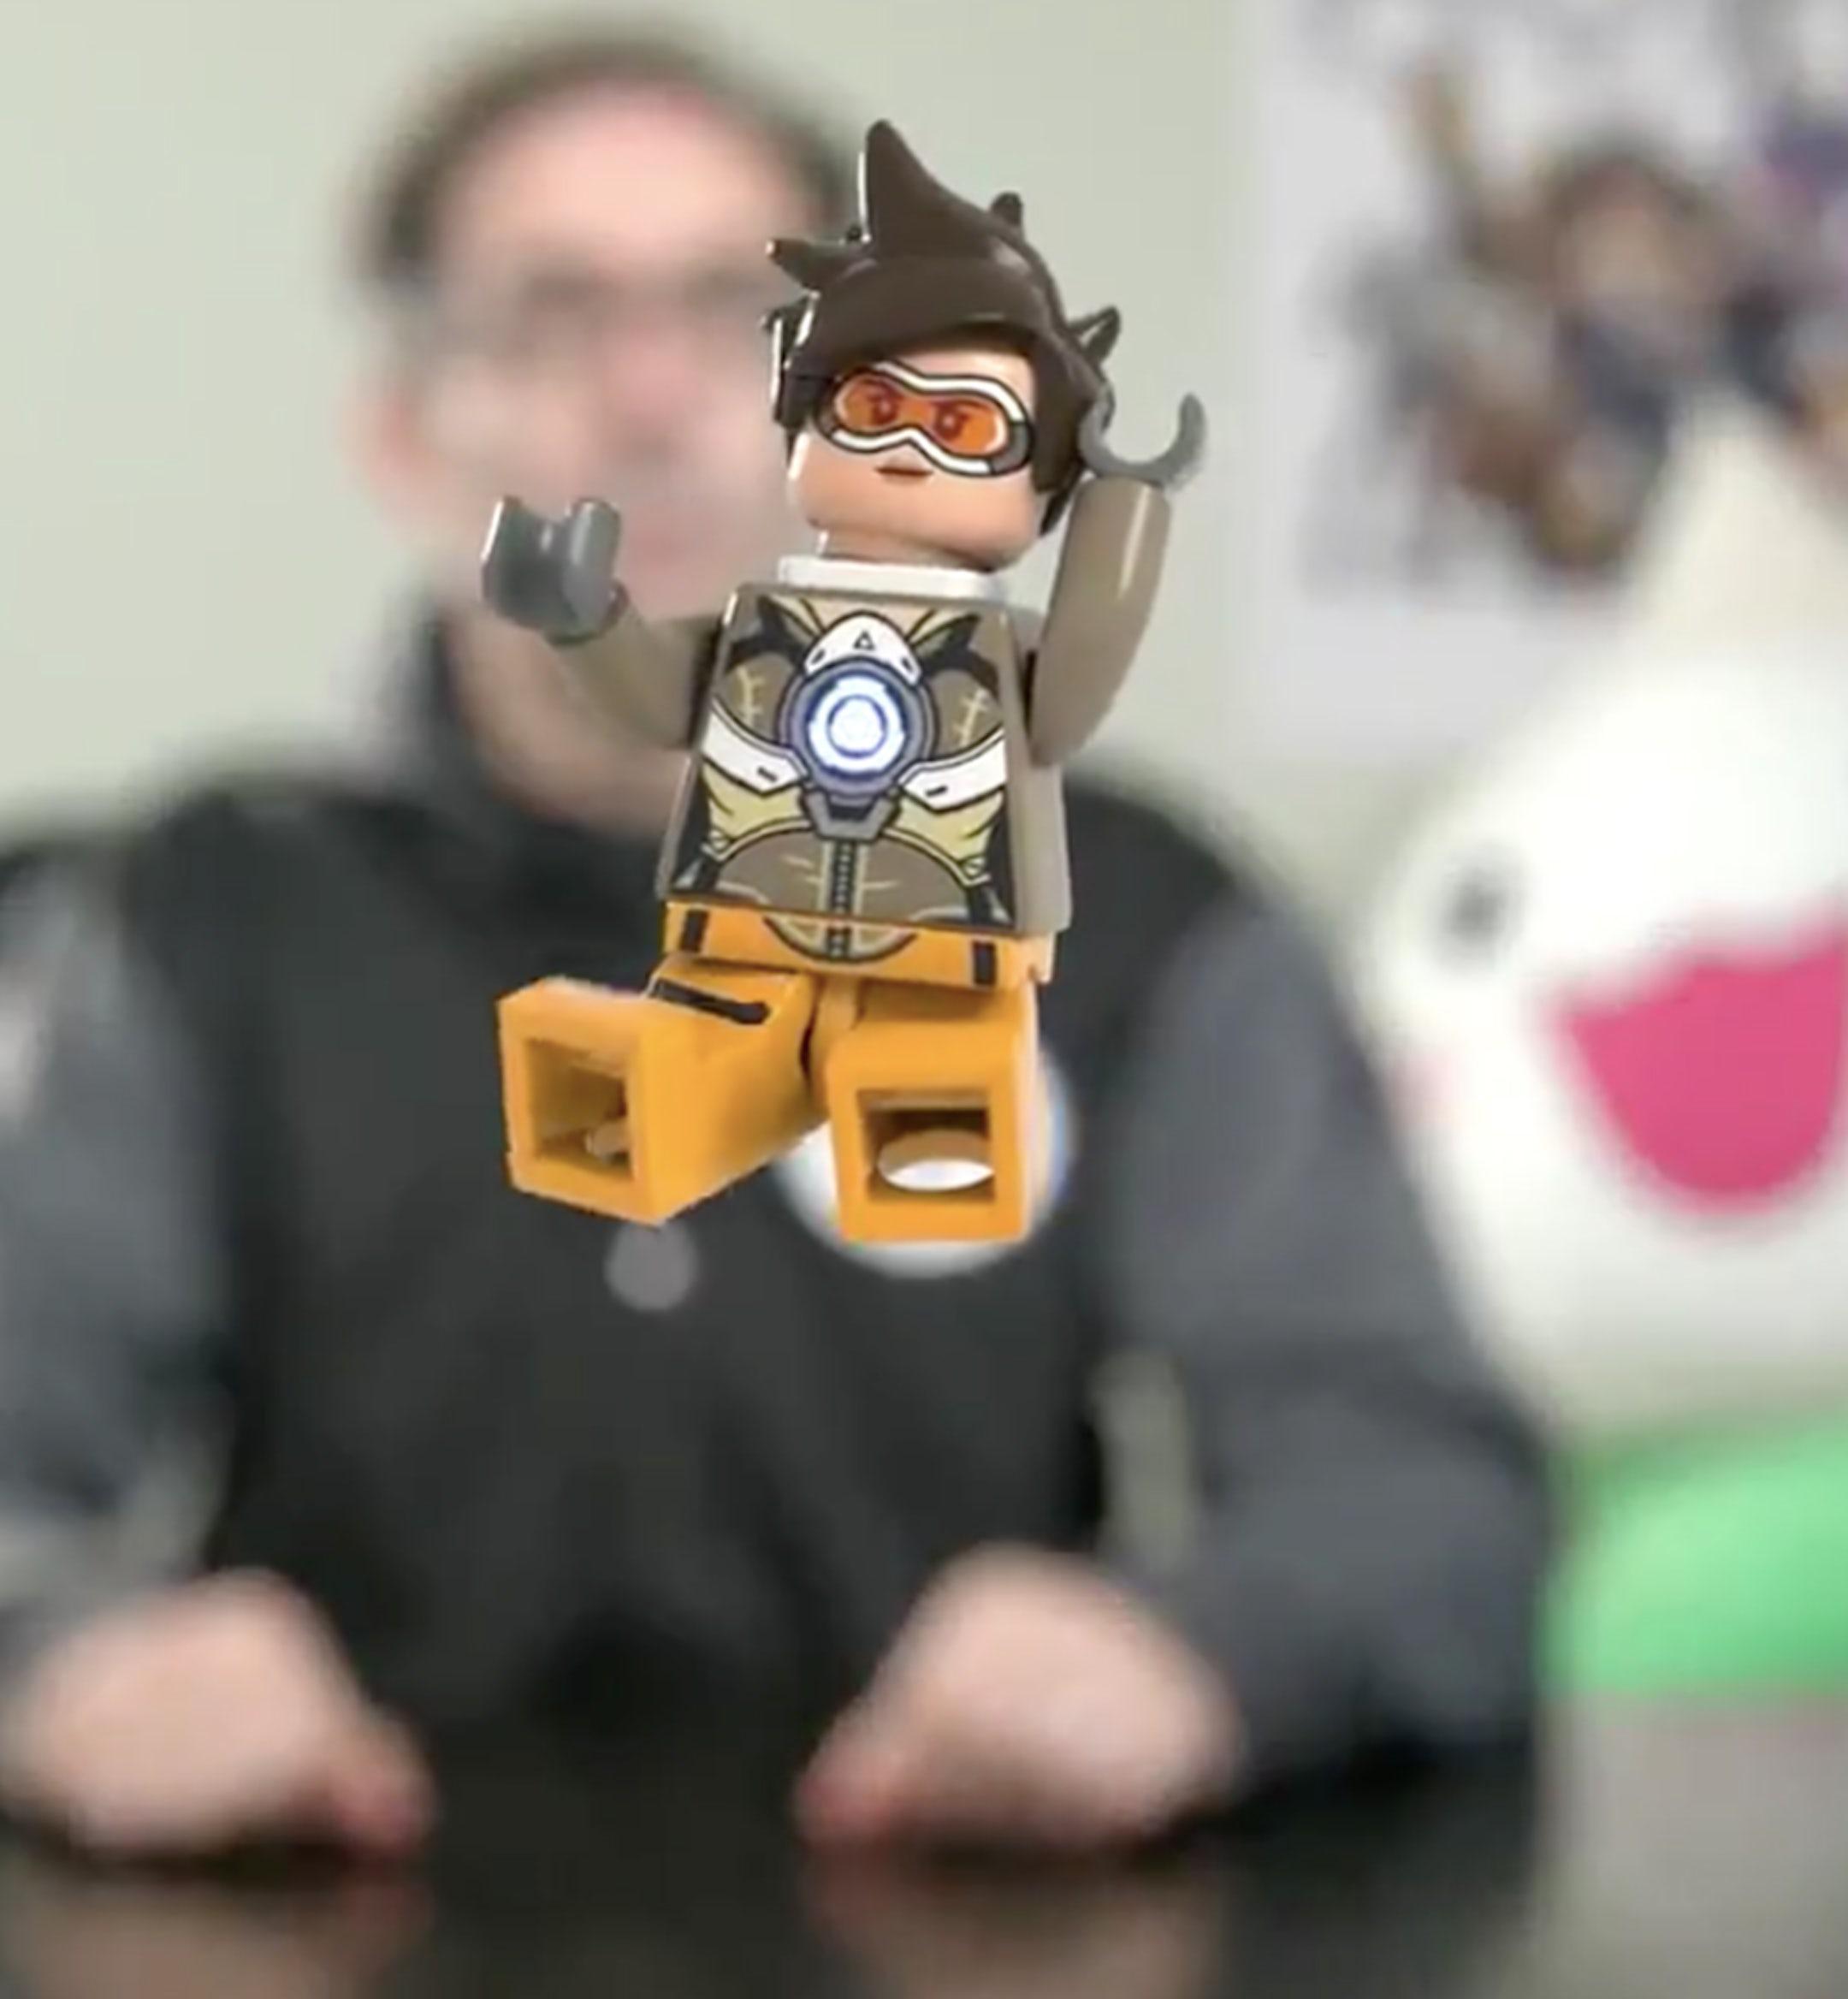 overwatch lego mobile hero